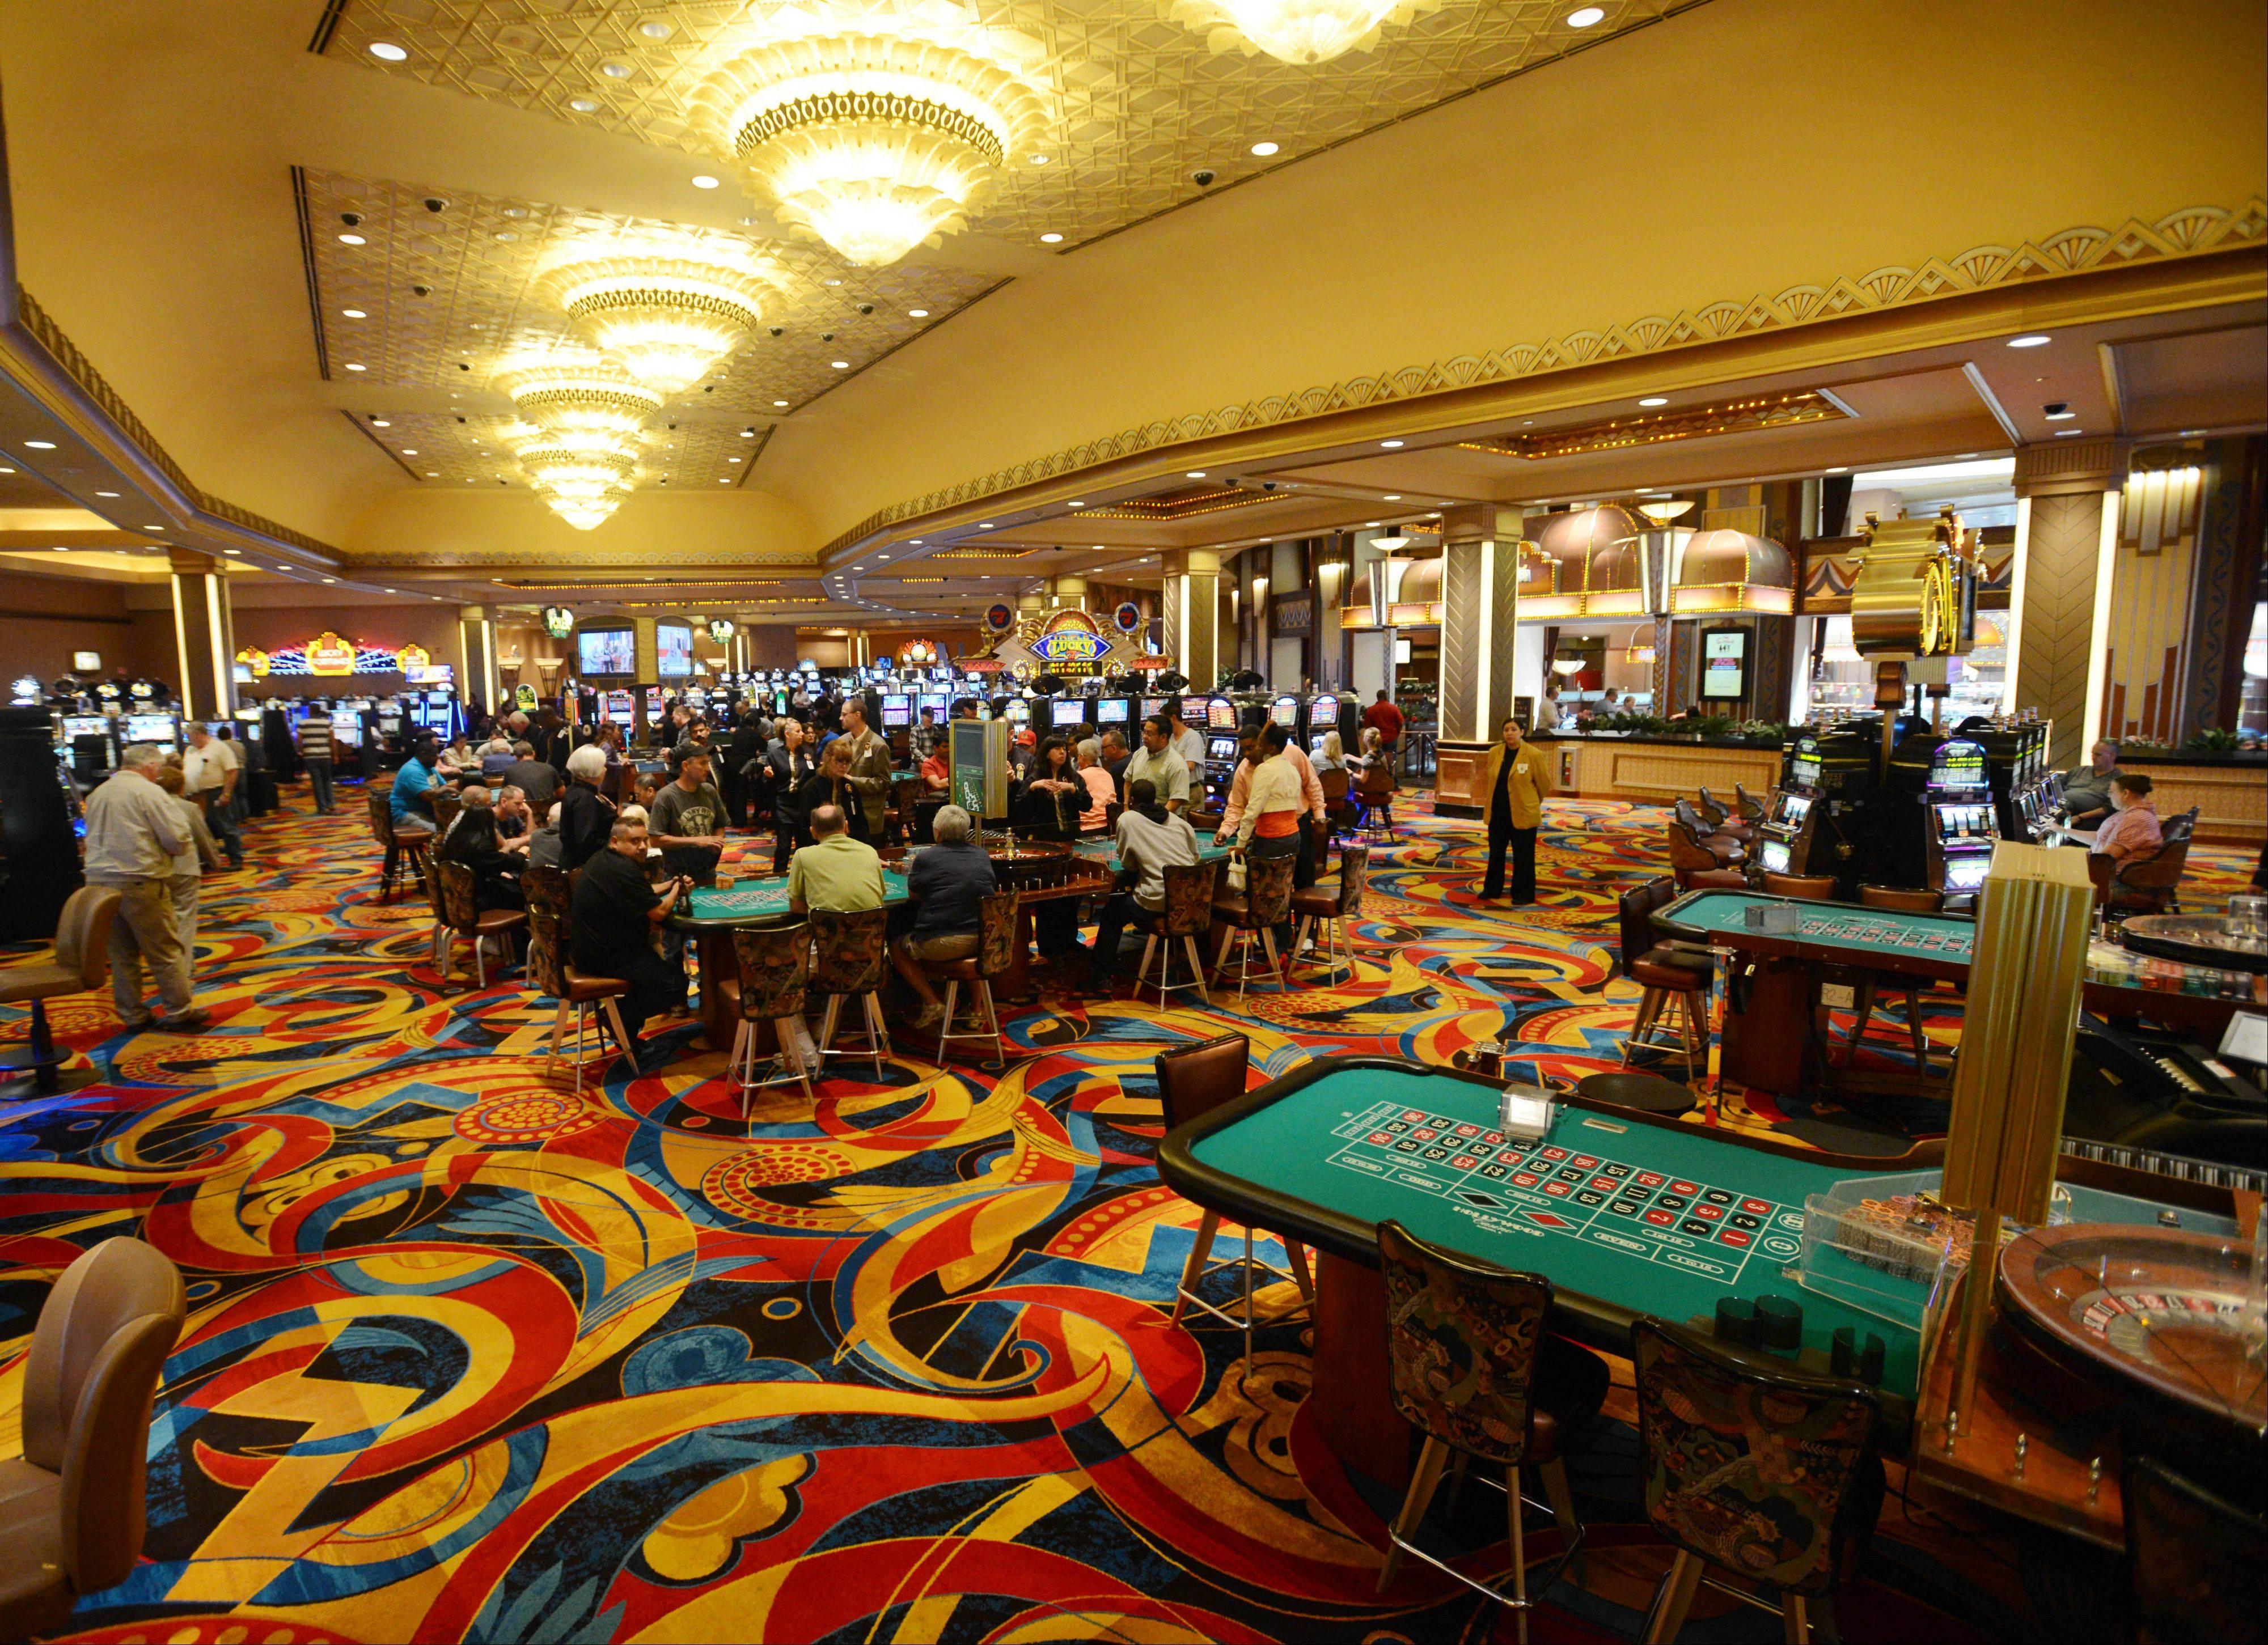 Aurora casino hollywood minimums table gambling grant applicants